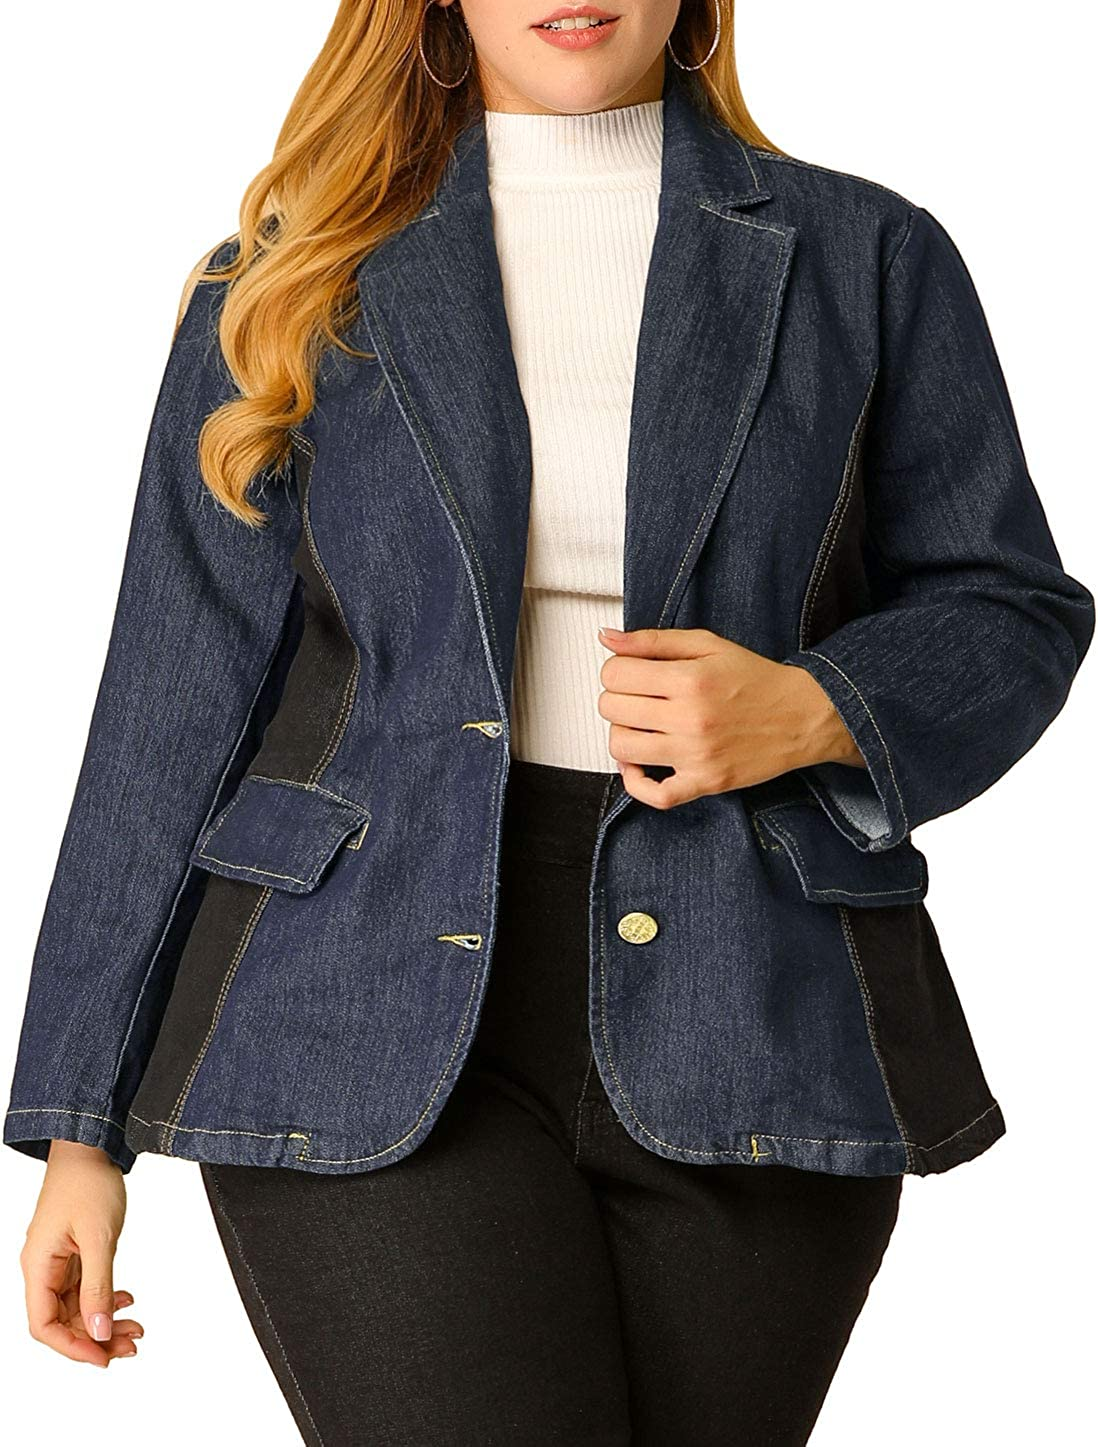 Agnes Orinda Women's Plus Size Denim Jackets Elegant Open Front Lapel Work Blazers